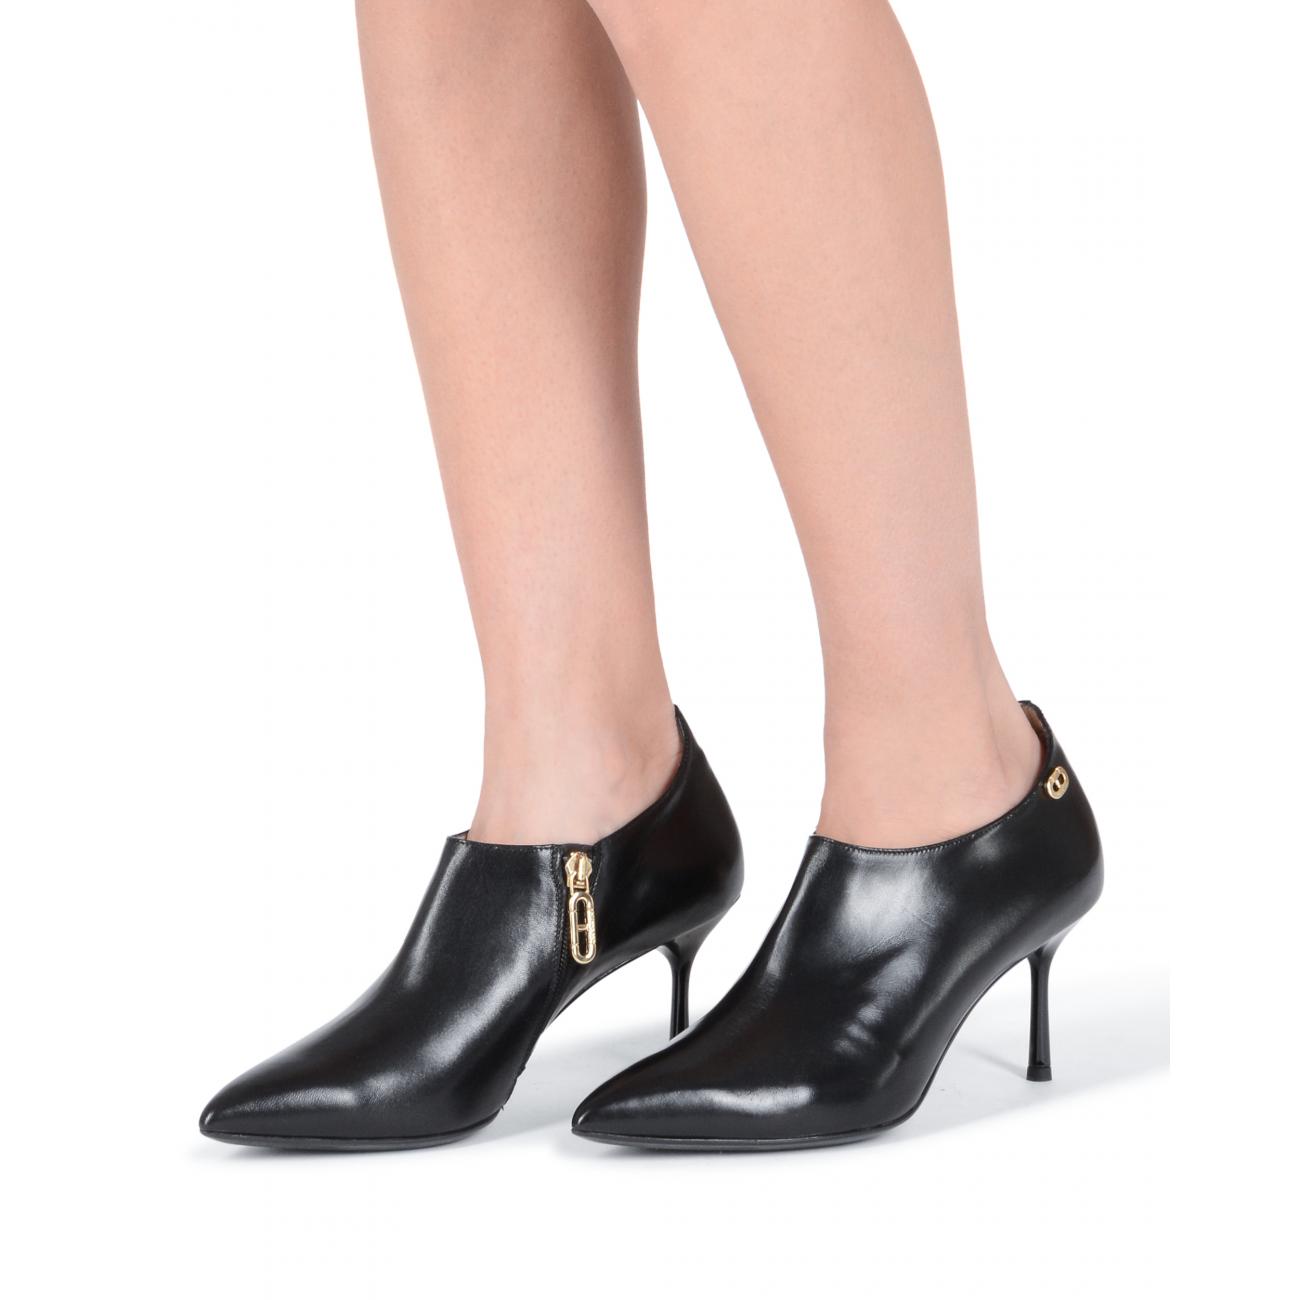 Dee Ocleppo Women's Ankle Boot Black DO28 NAPPA NERO